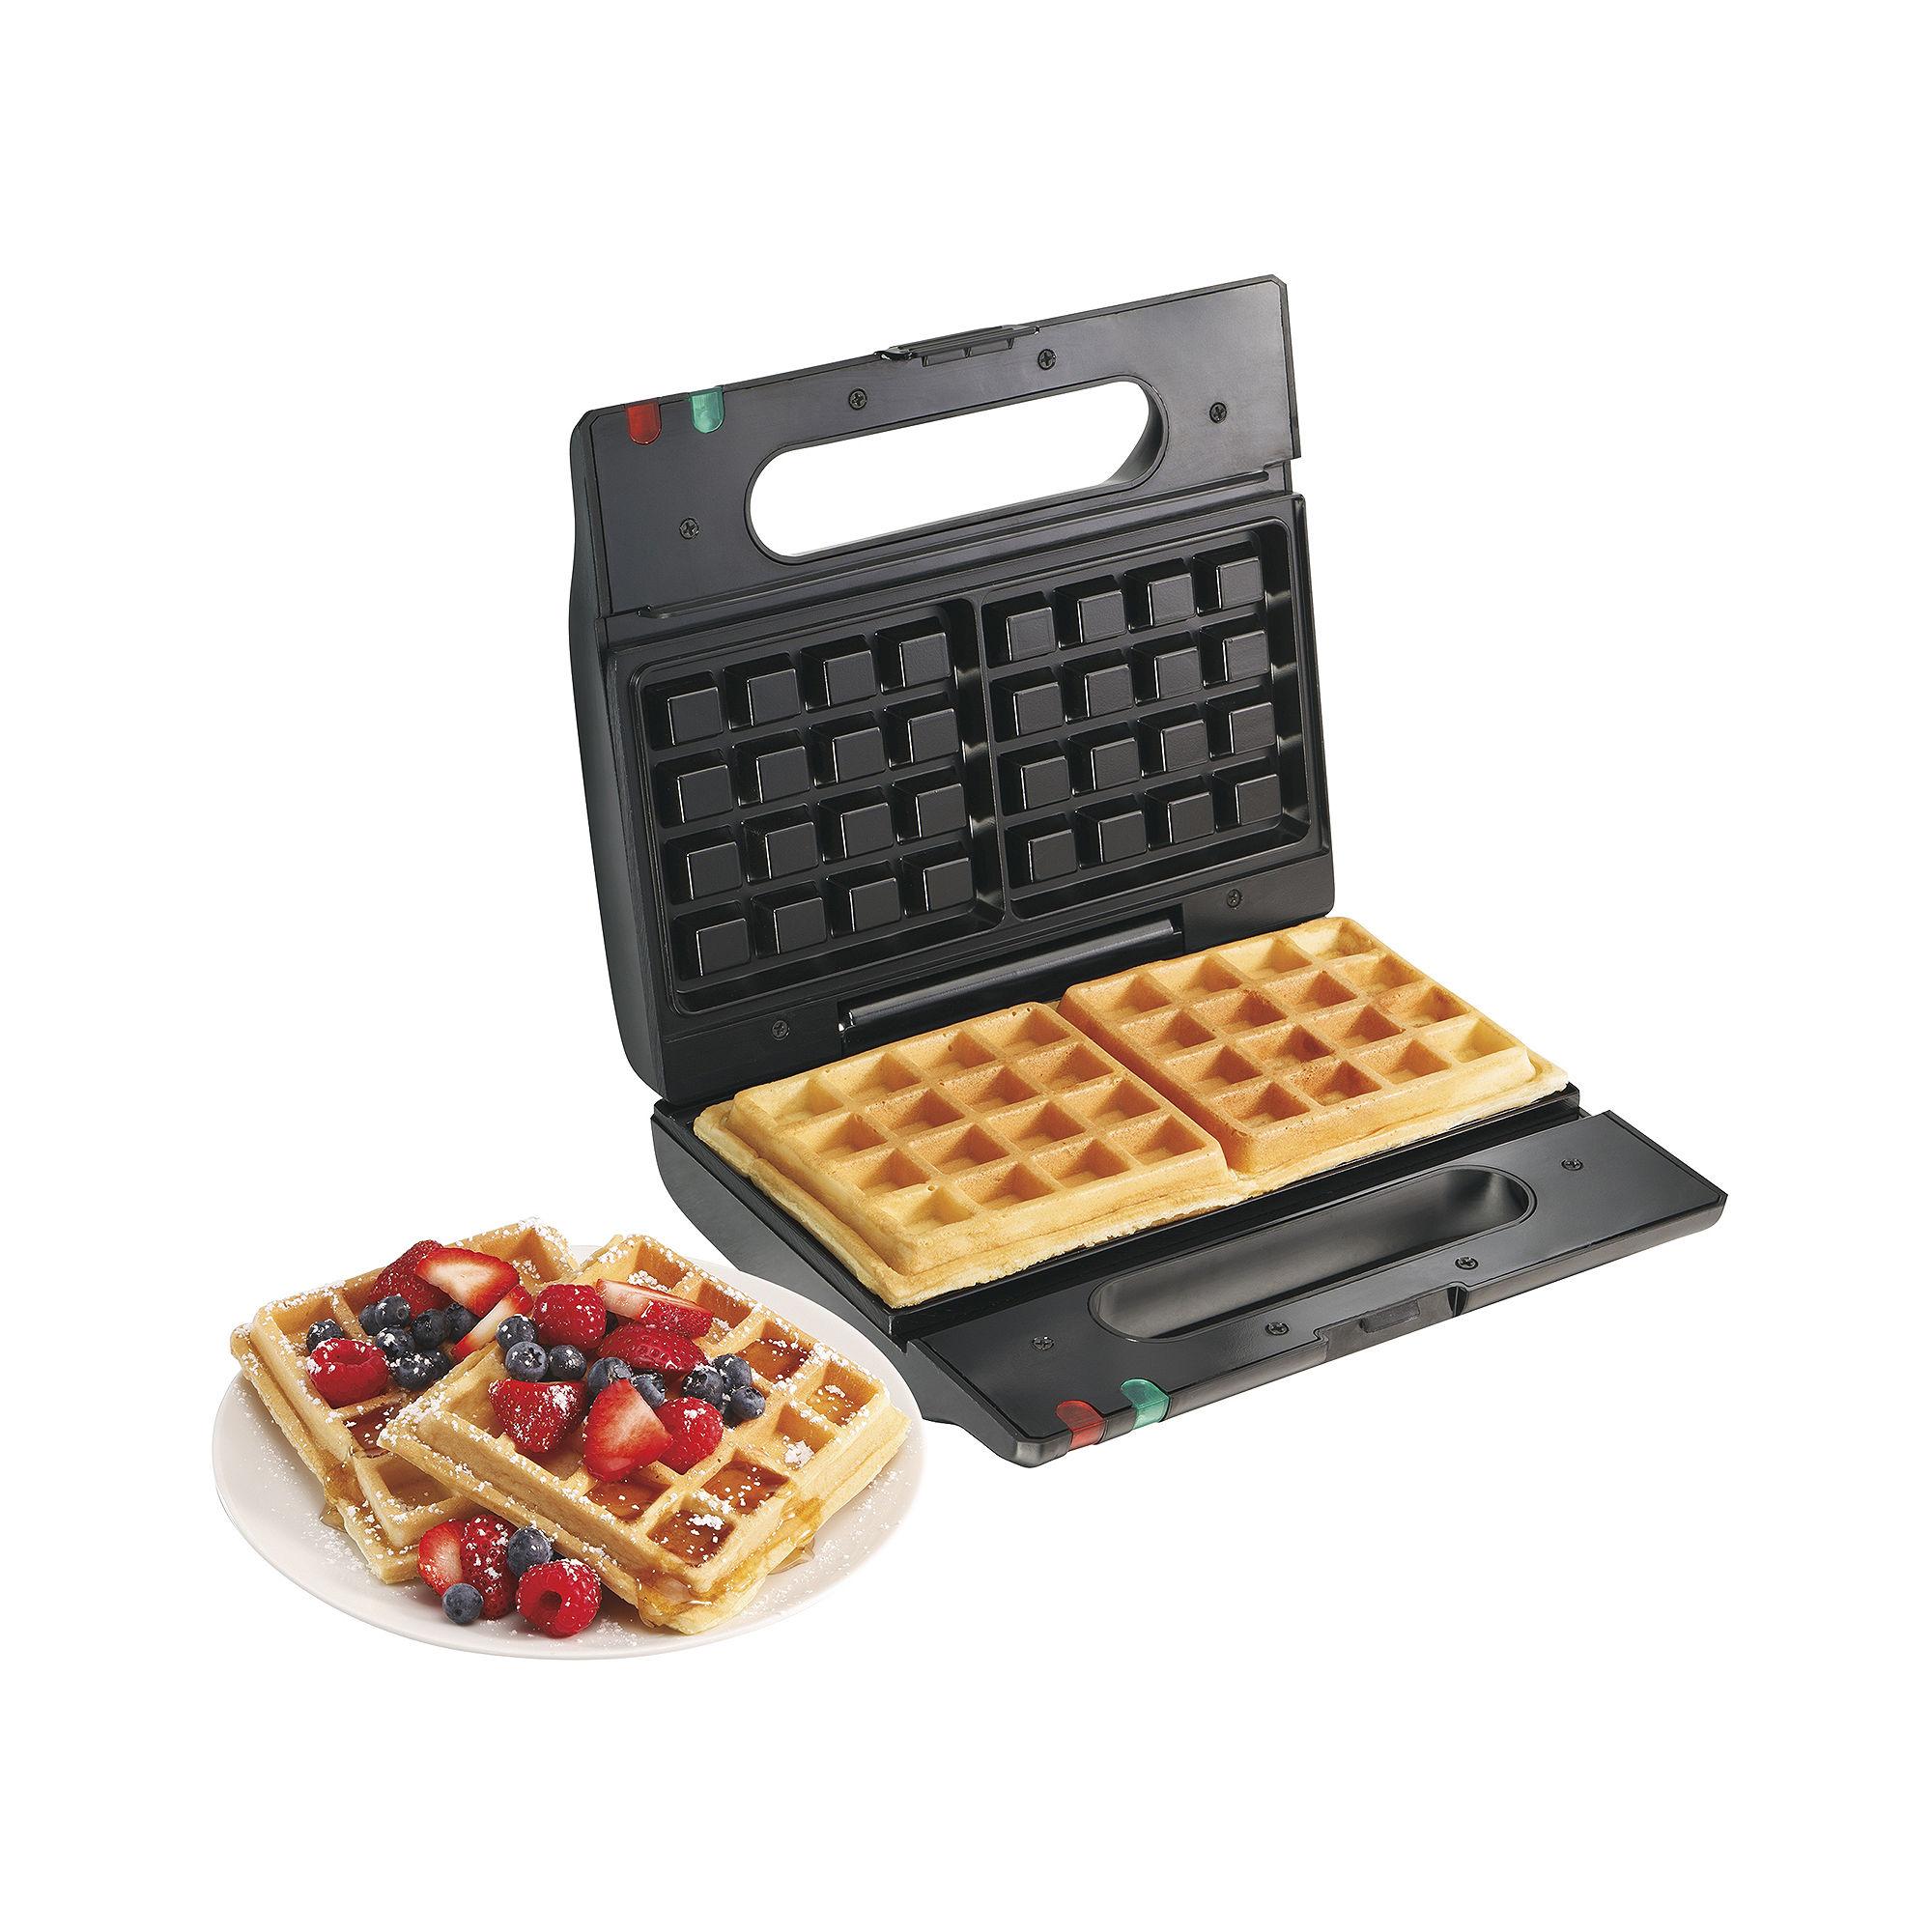 Proctor-Silex Belgian Flip Waffle Maker